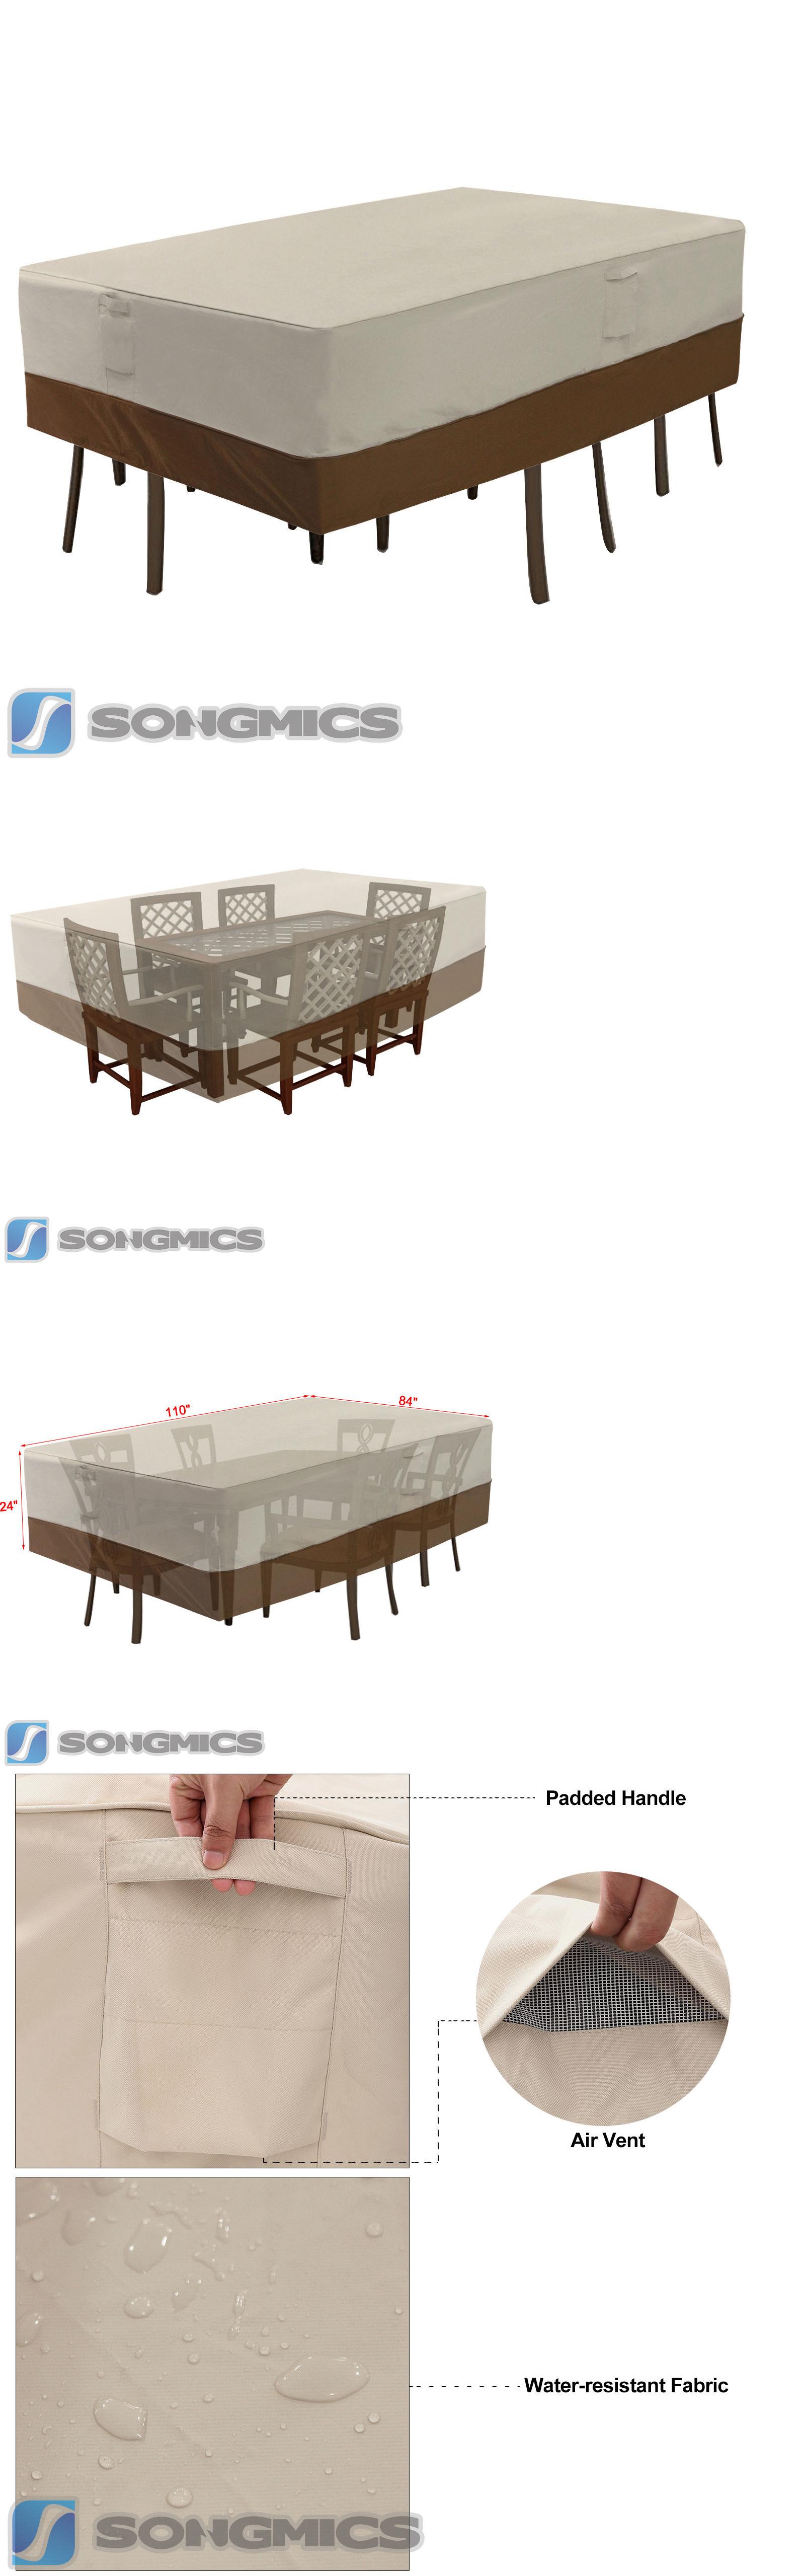 ce7bd1f52dd6f79ec7816630bd21def0 Top Result 50 Unique Waterproof Patio Furniture Covers Pic 2017 Iqt4